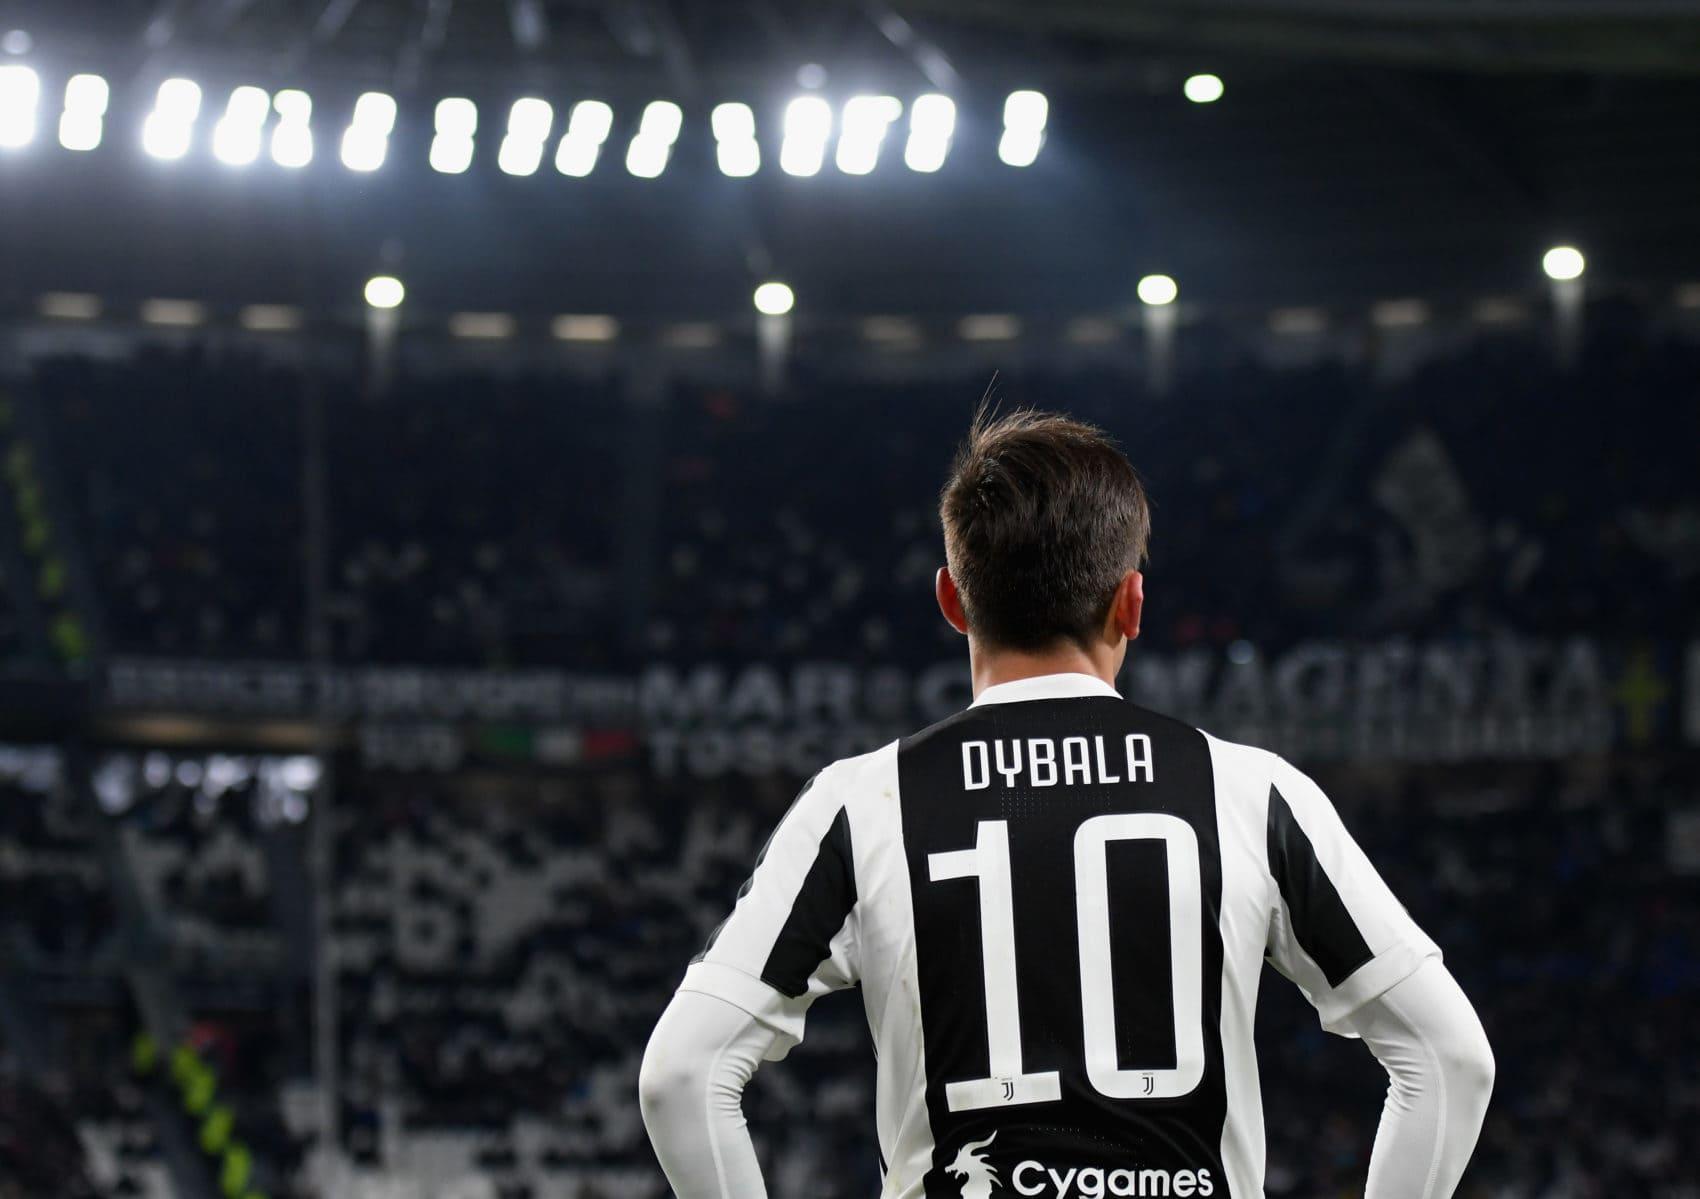 dybala-number10